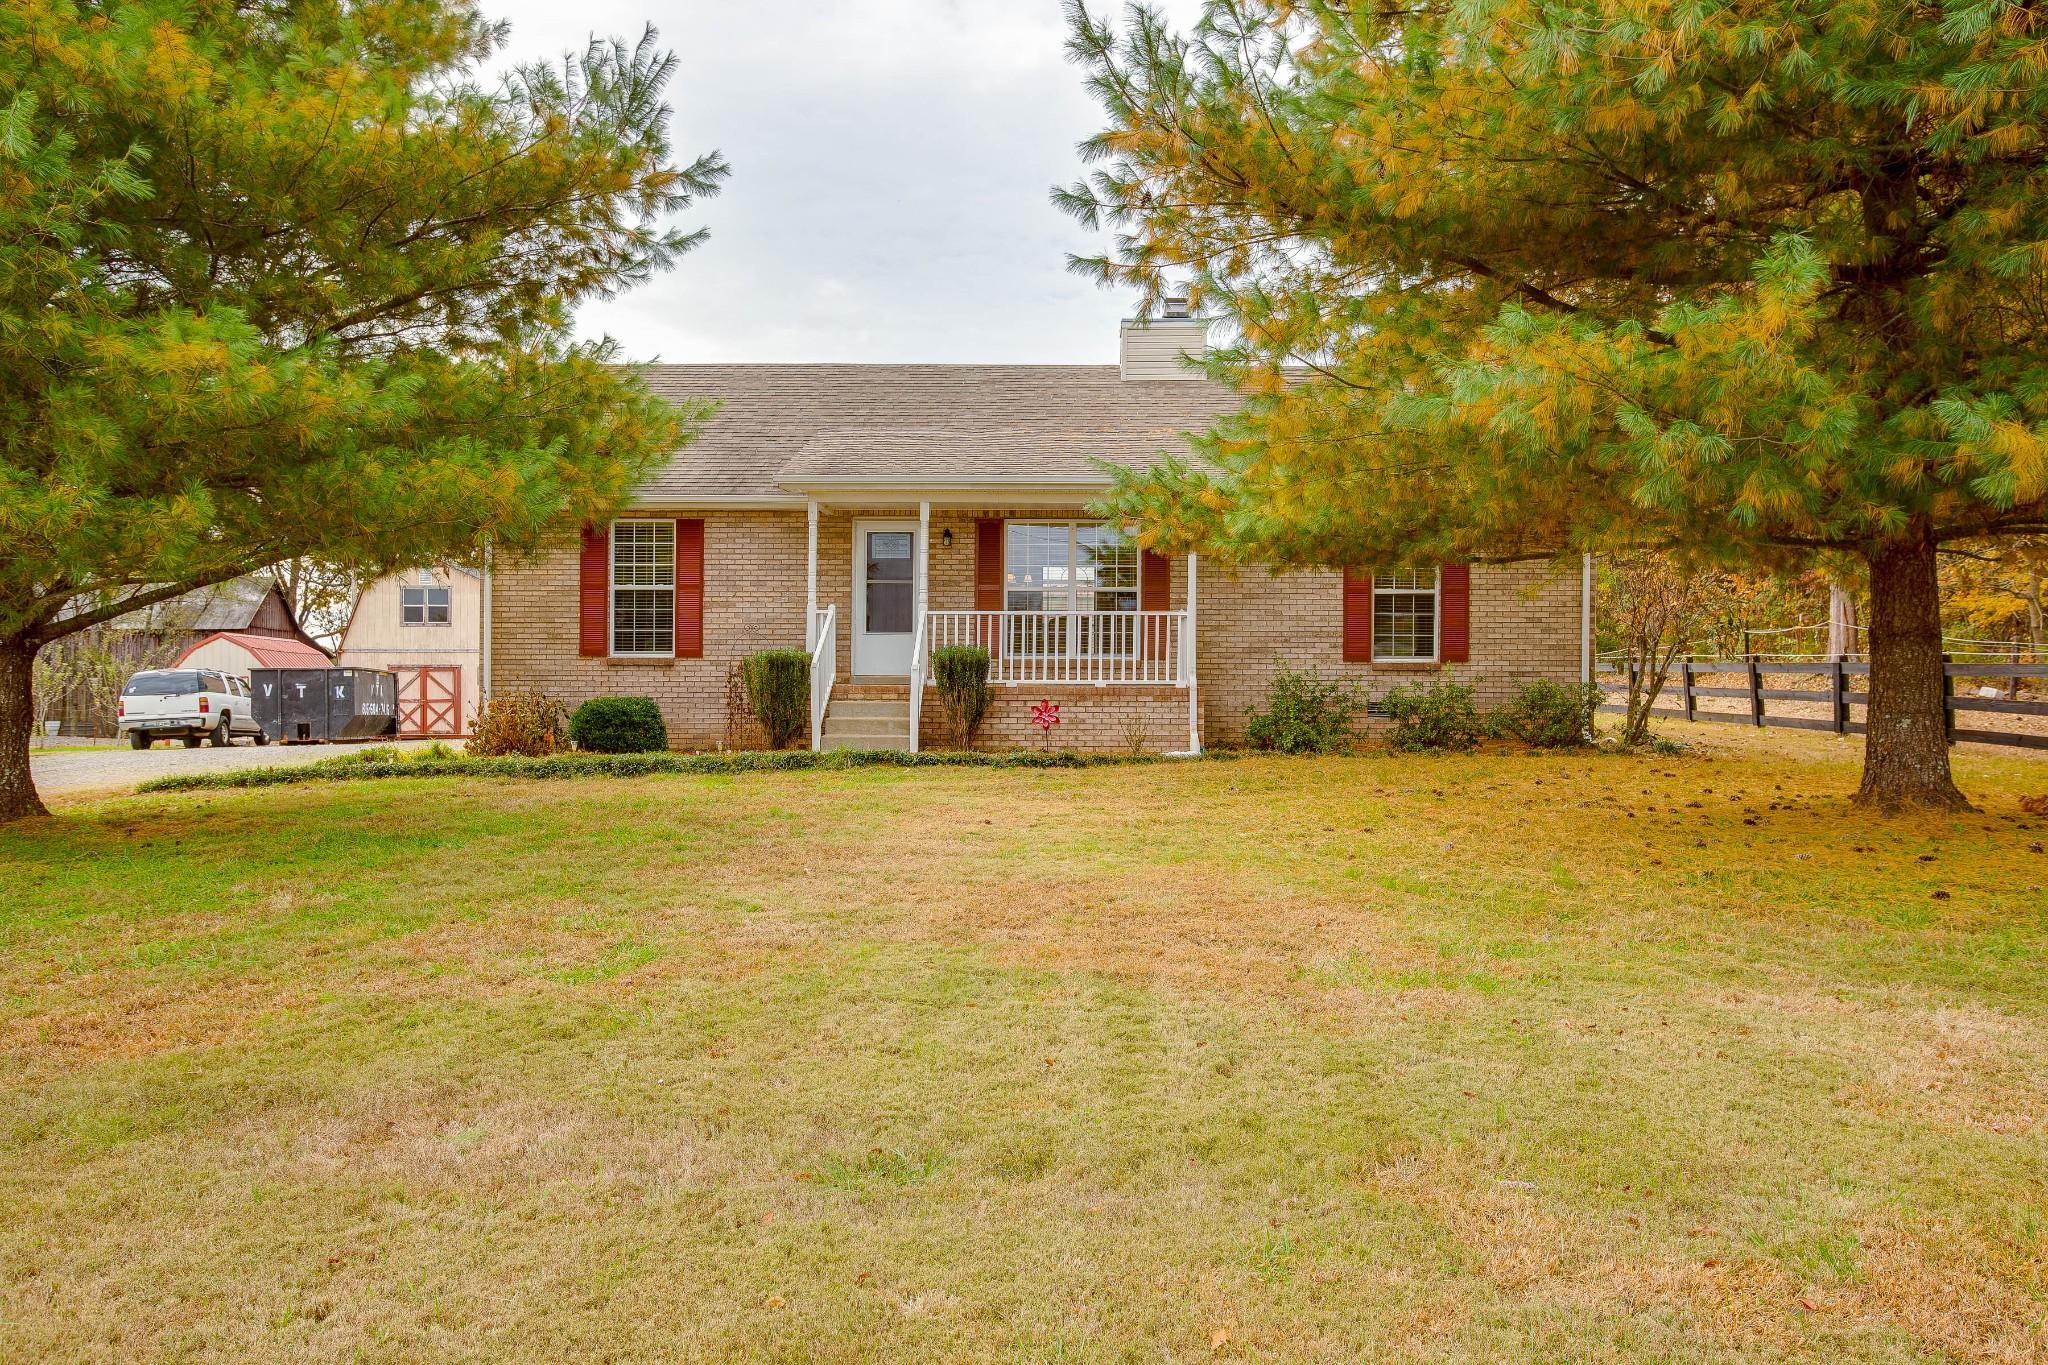 7829 Elm Springs Rd, Orlinda, TN 37141 - Orlinda, TN real estate listing